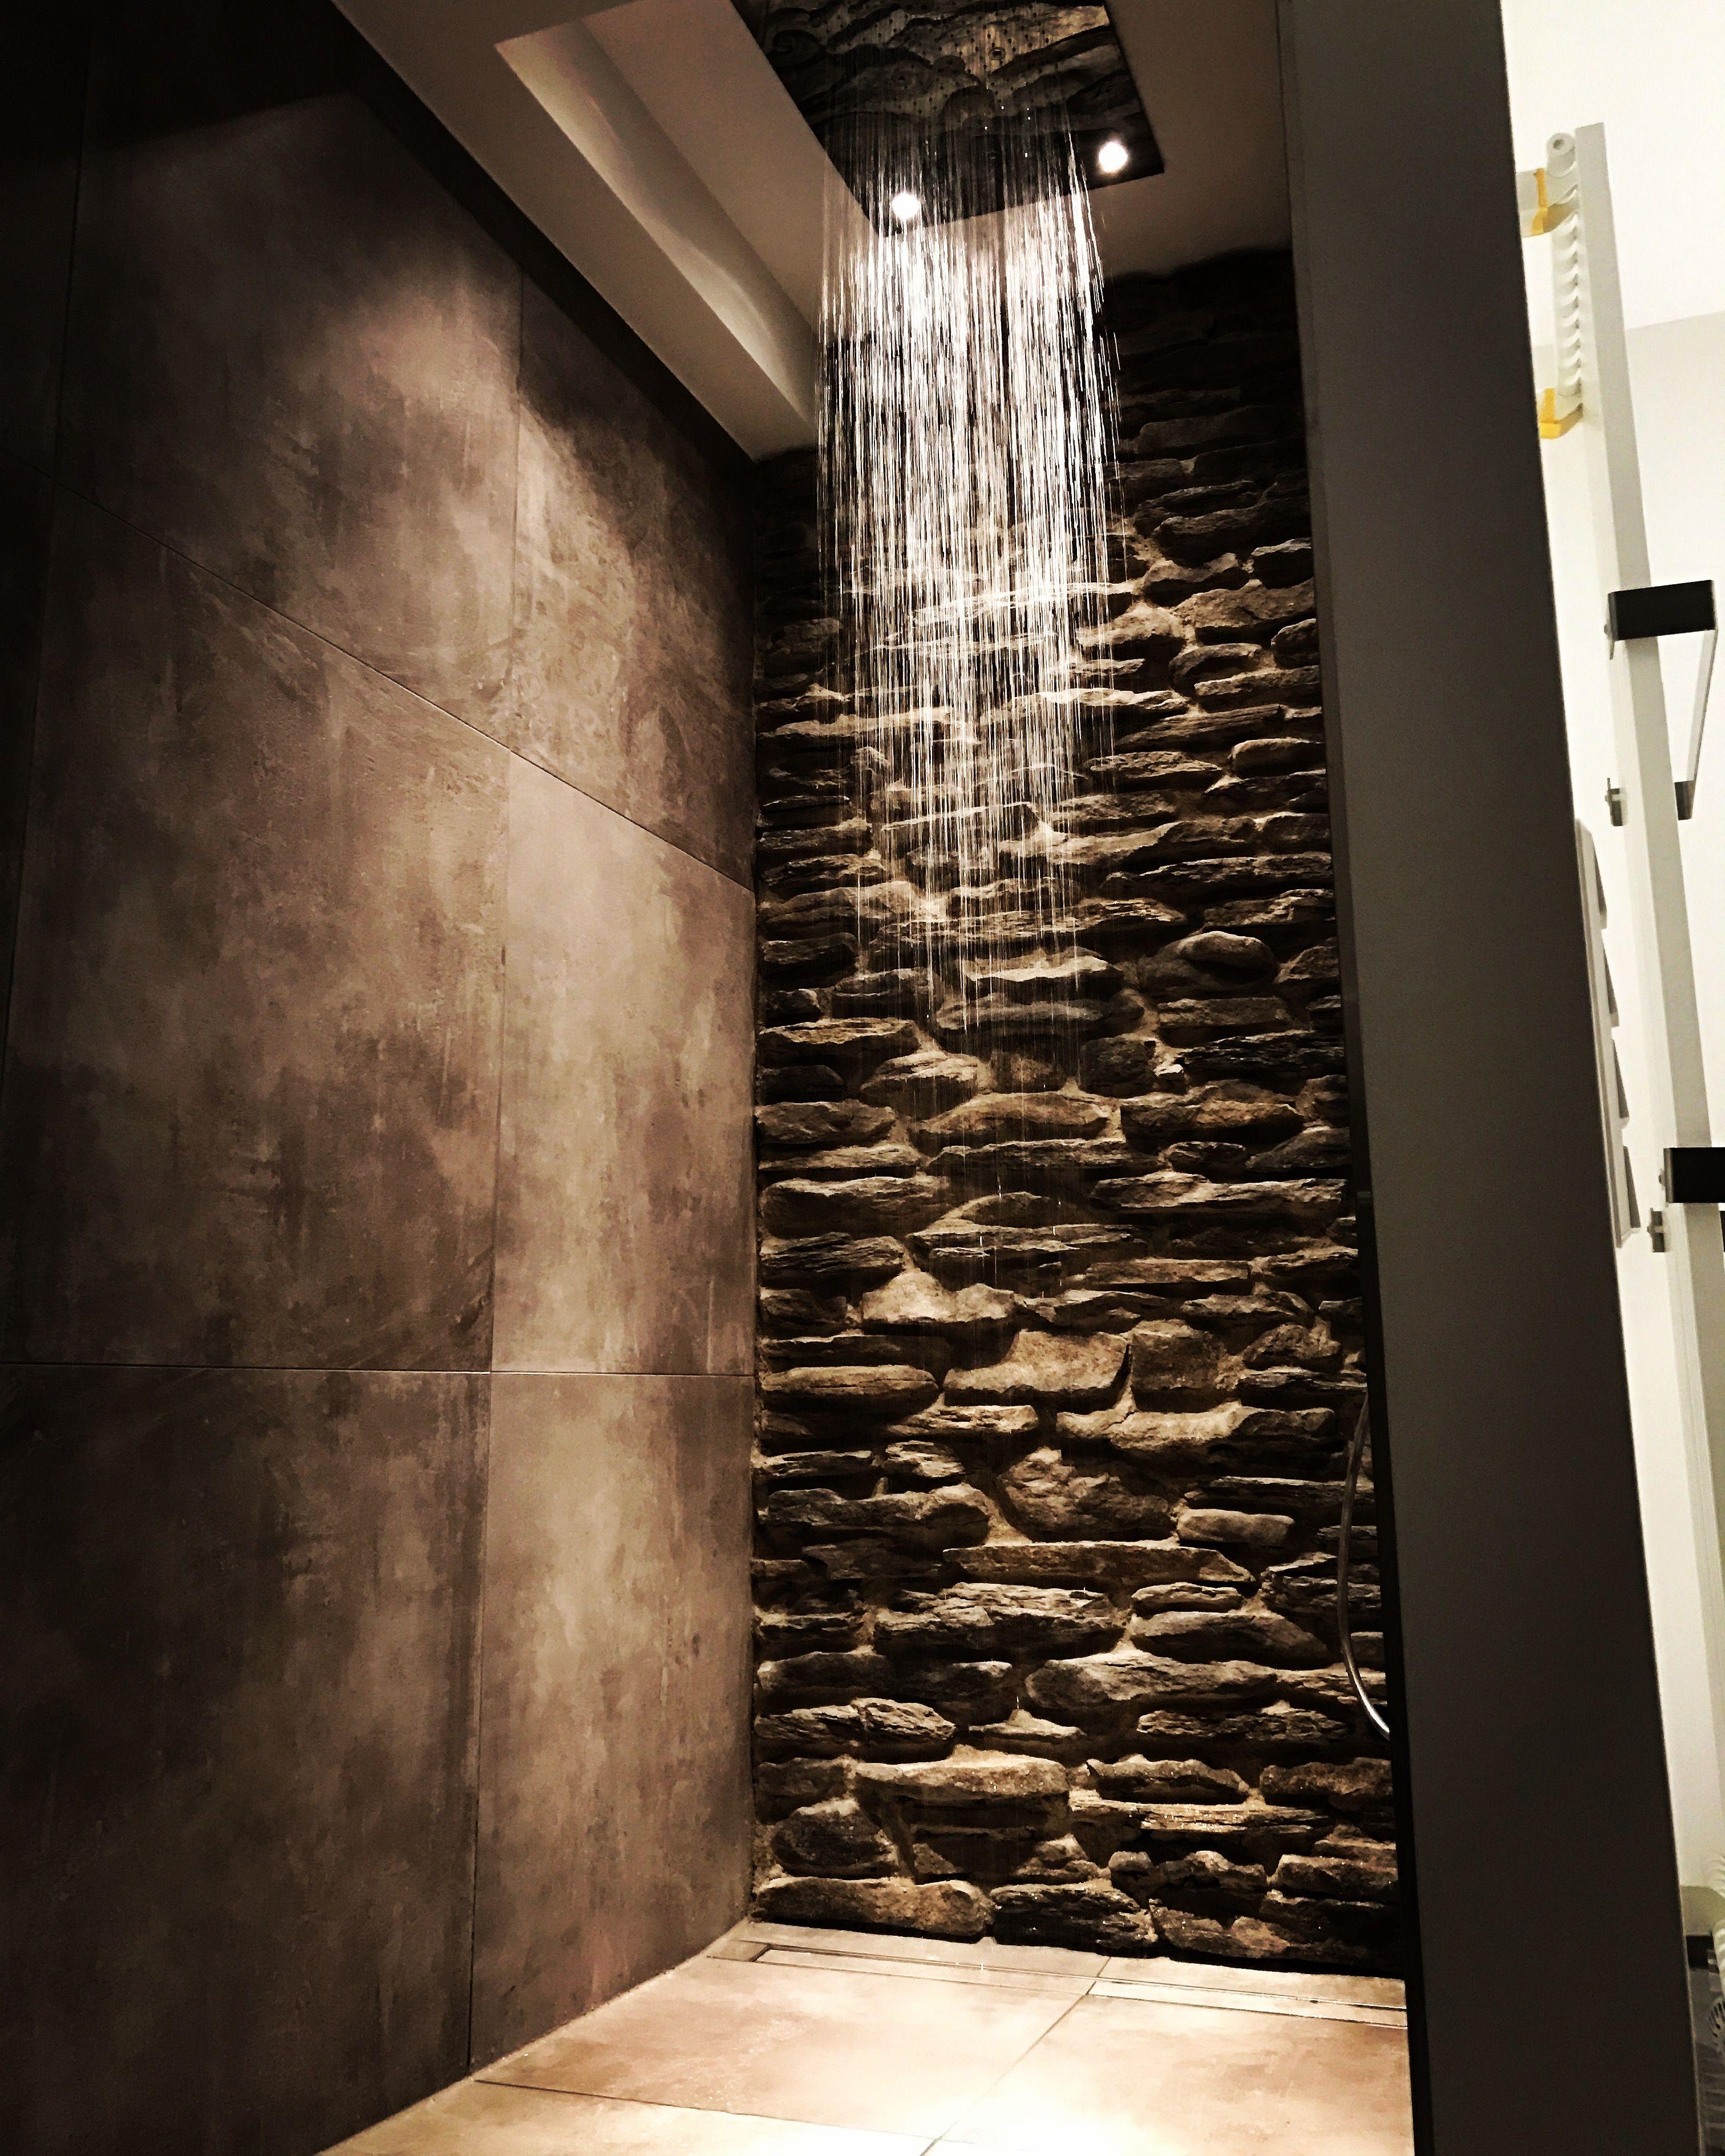 bathroom badezimmer natursteinwand hansgrohe rainmaker dusche shower  Salon Lambertz